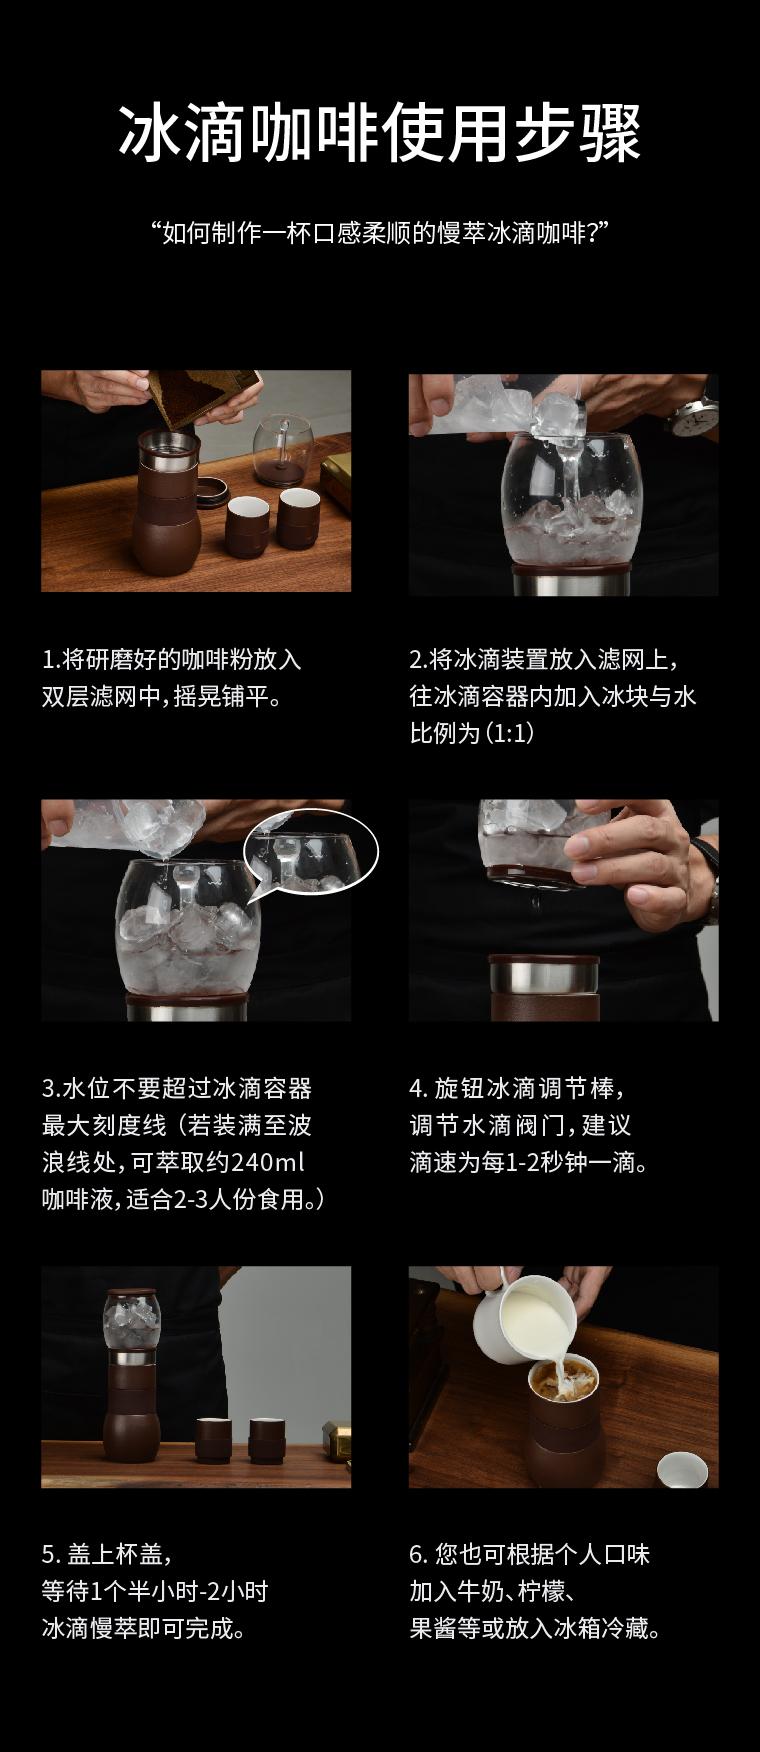 小啡机7-02.jpg